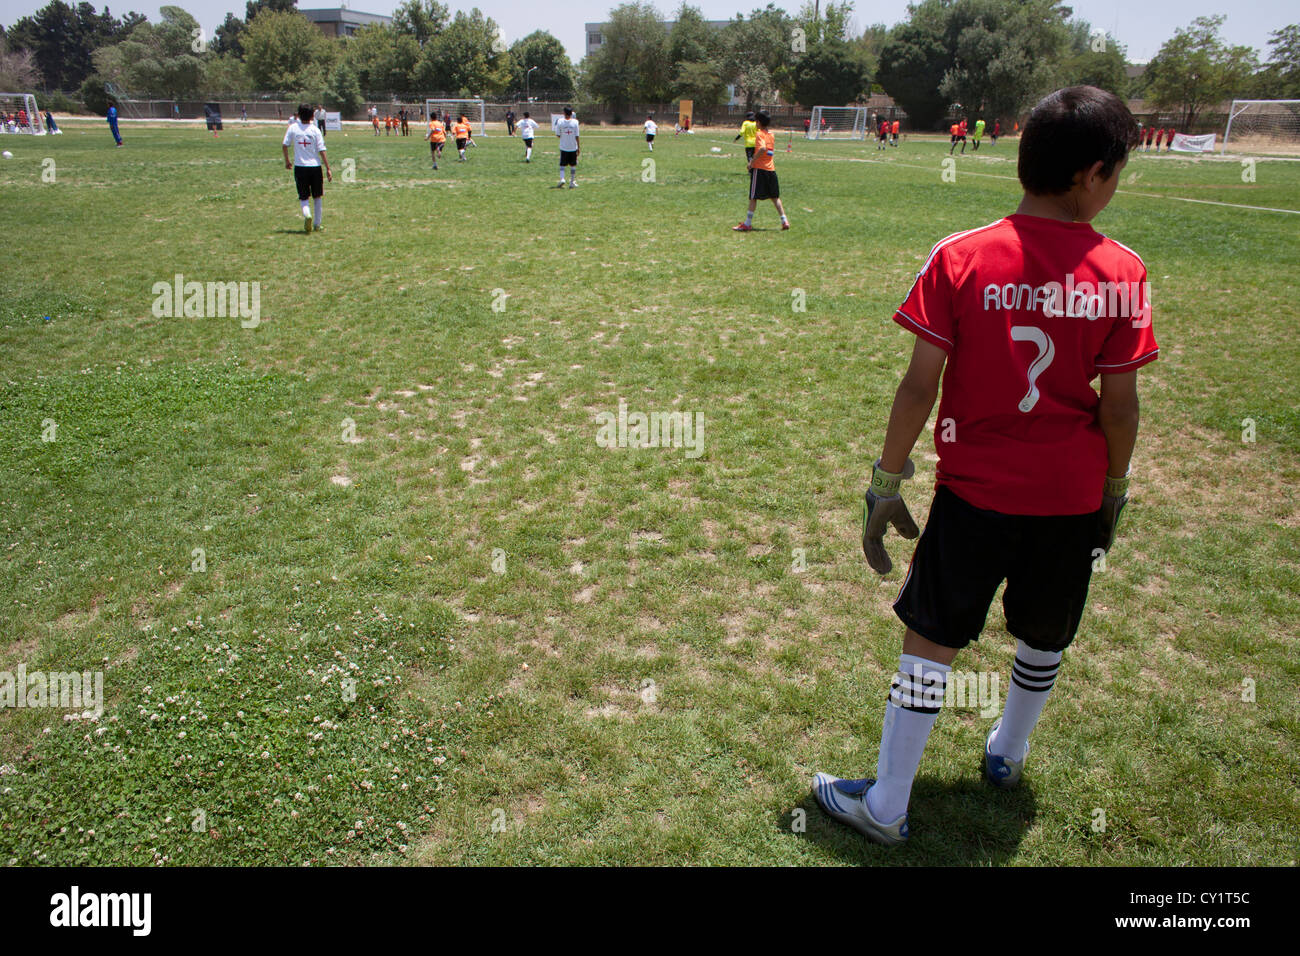 afghans child boys football player tournament boy - Stock Image